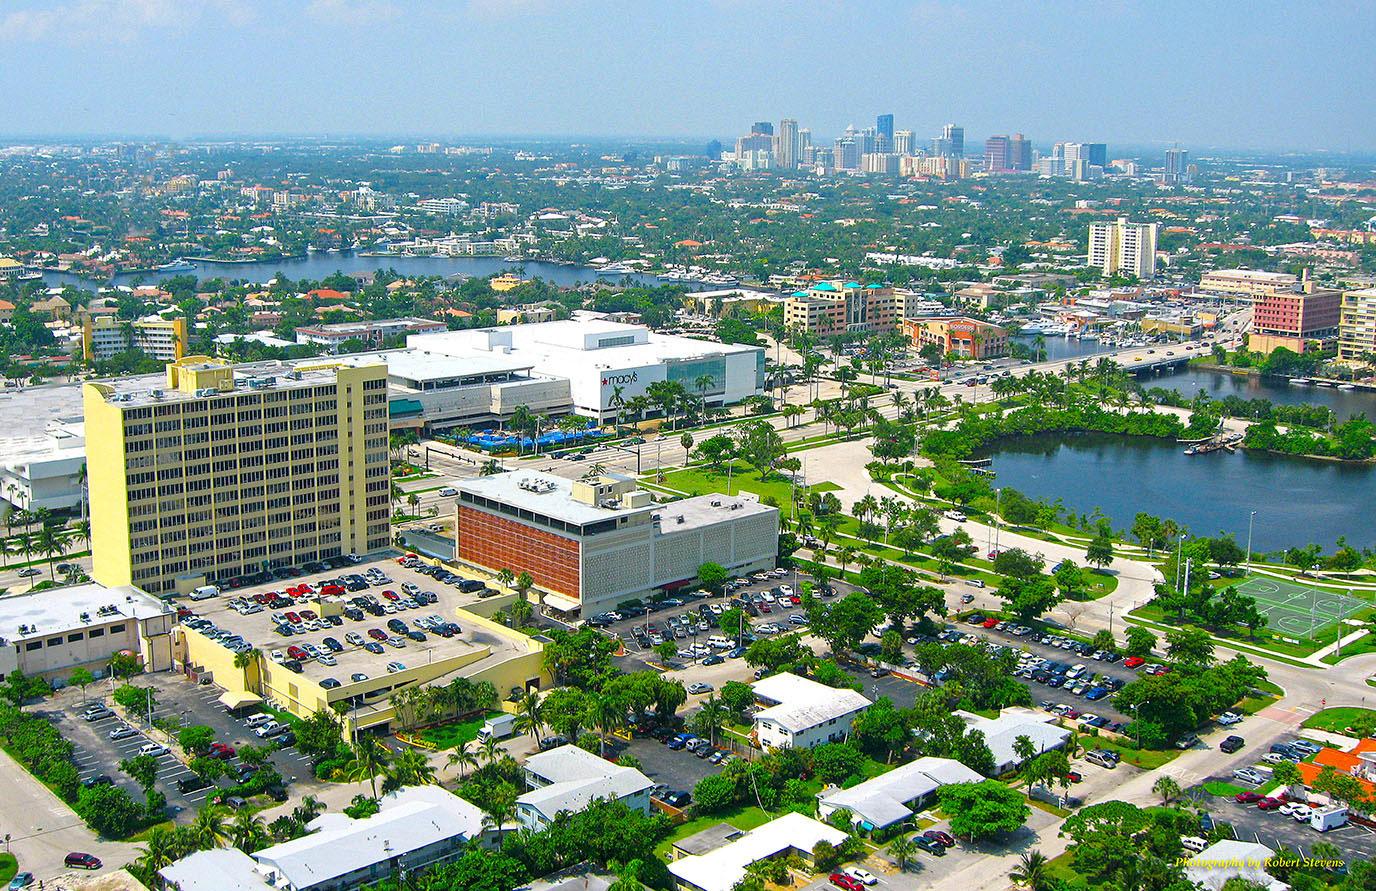 1040-Bayview-Drive-Aerial-Photo-5-1